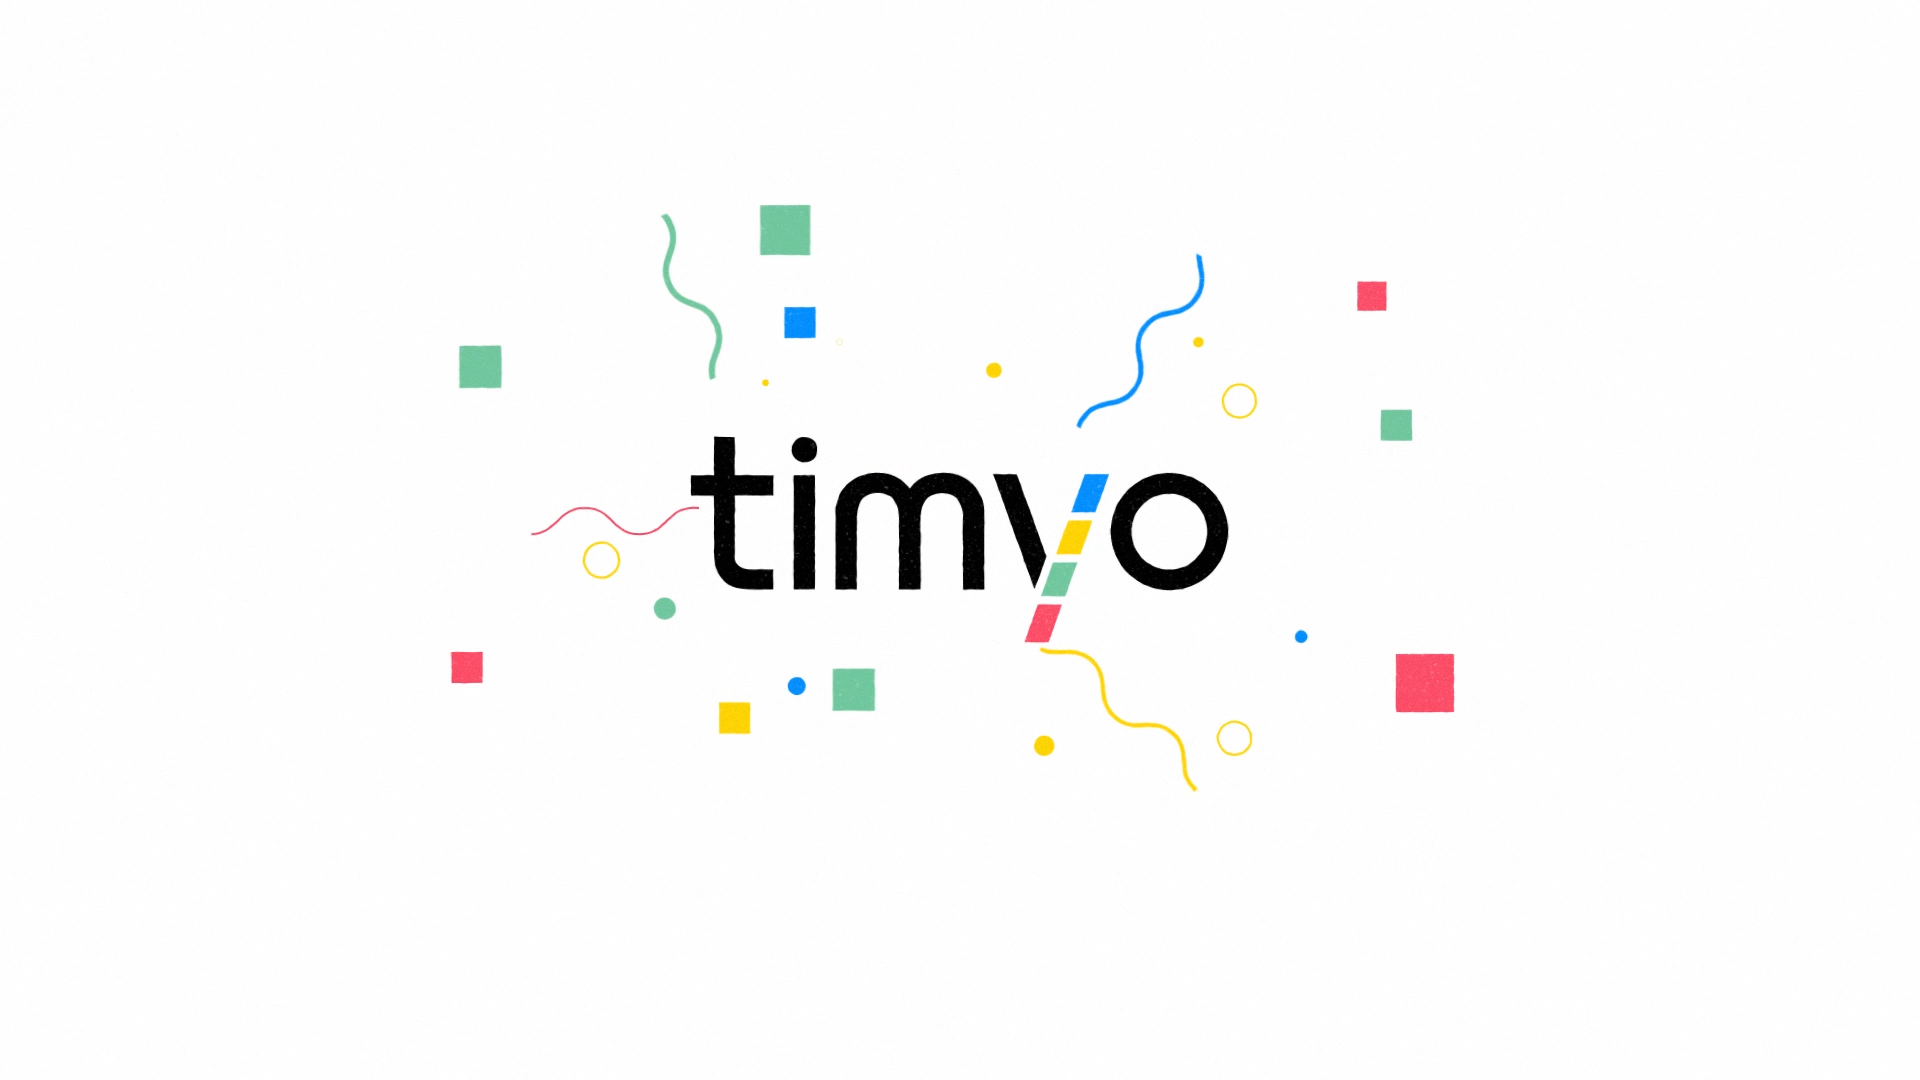 Timyo_Concept_RKS_MP4_00663.jpg